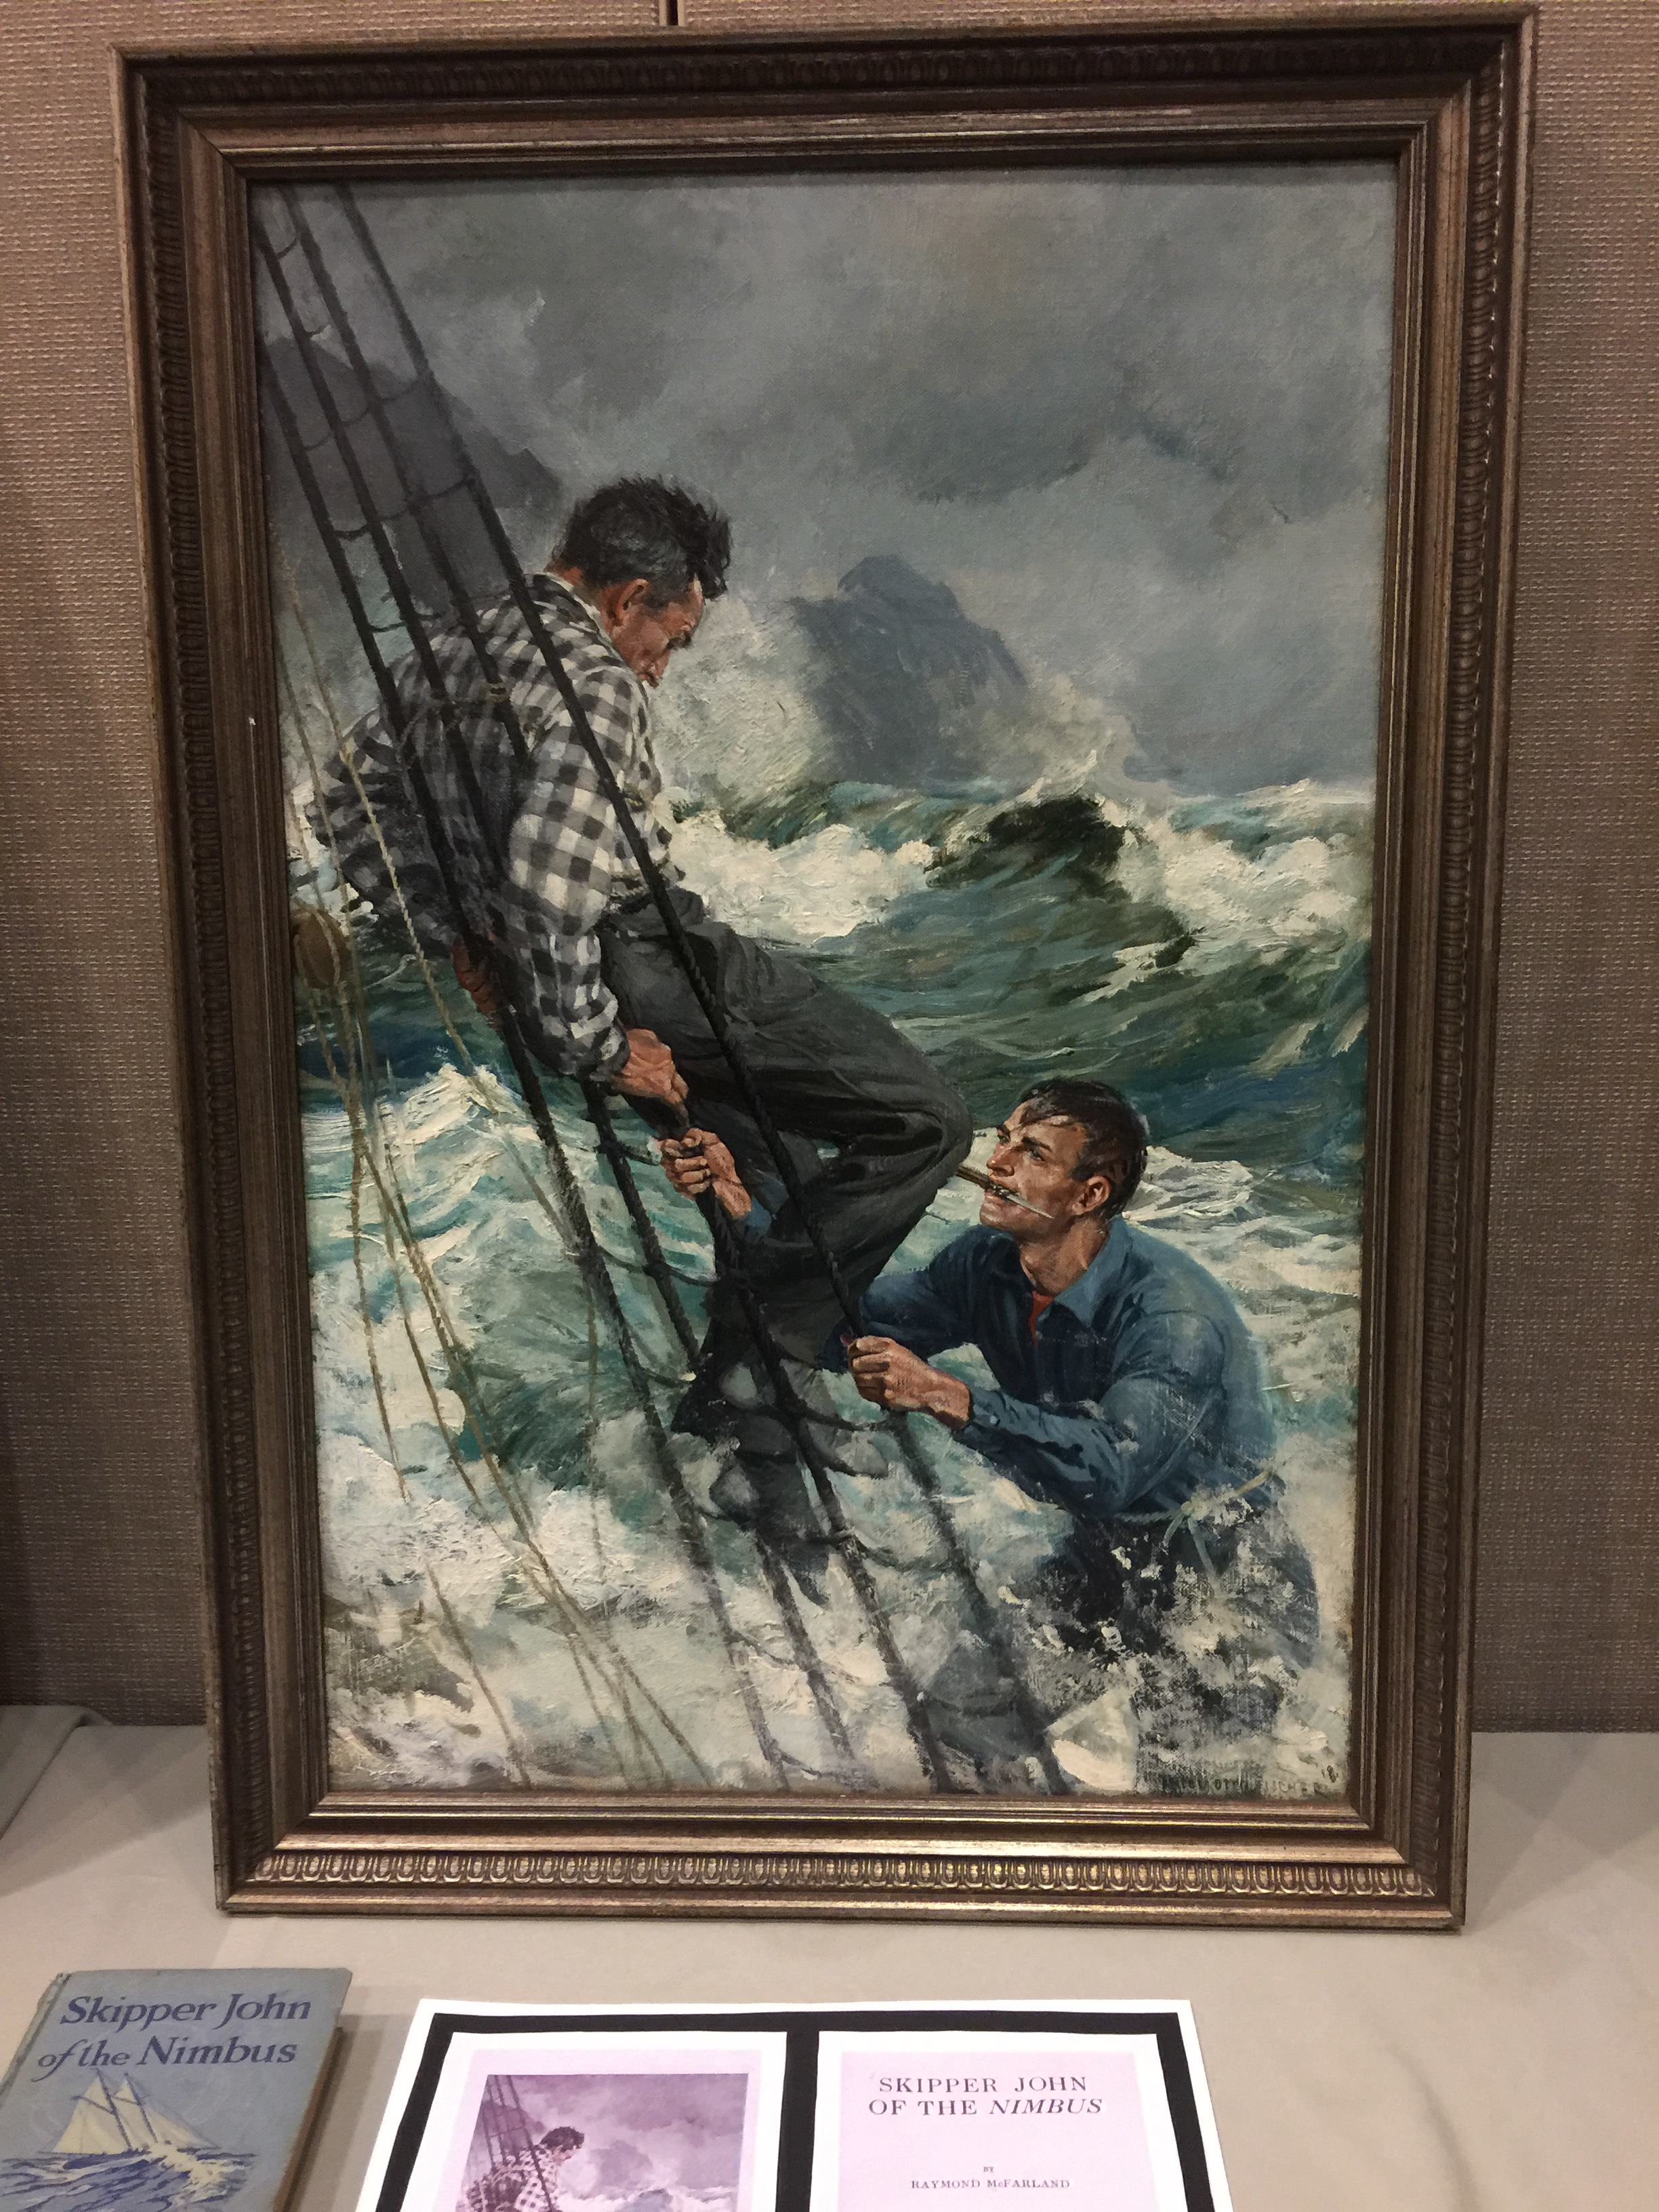 Anton Otto Fischer frontispiece for Skipper John of the Nimbus